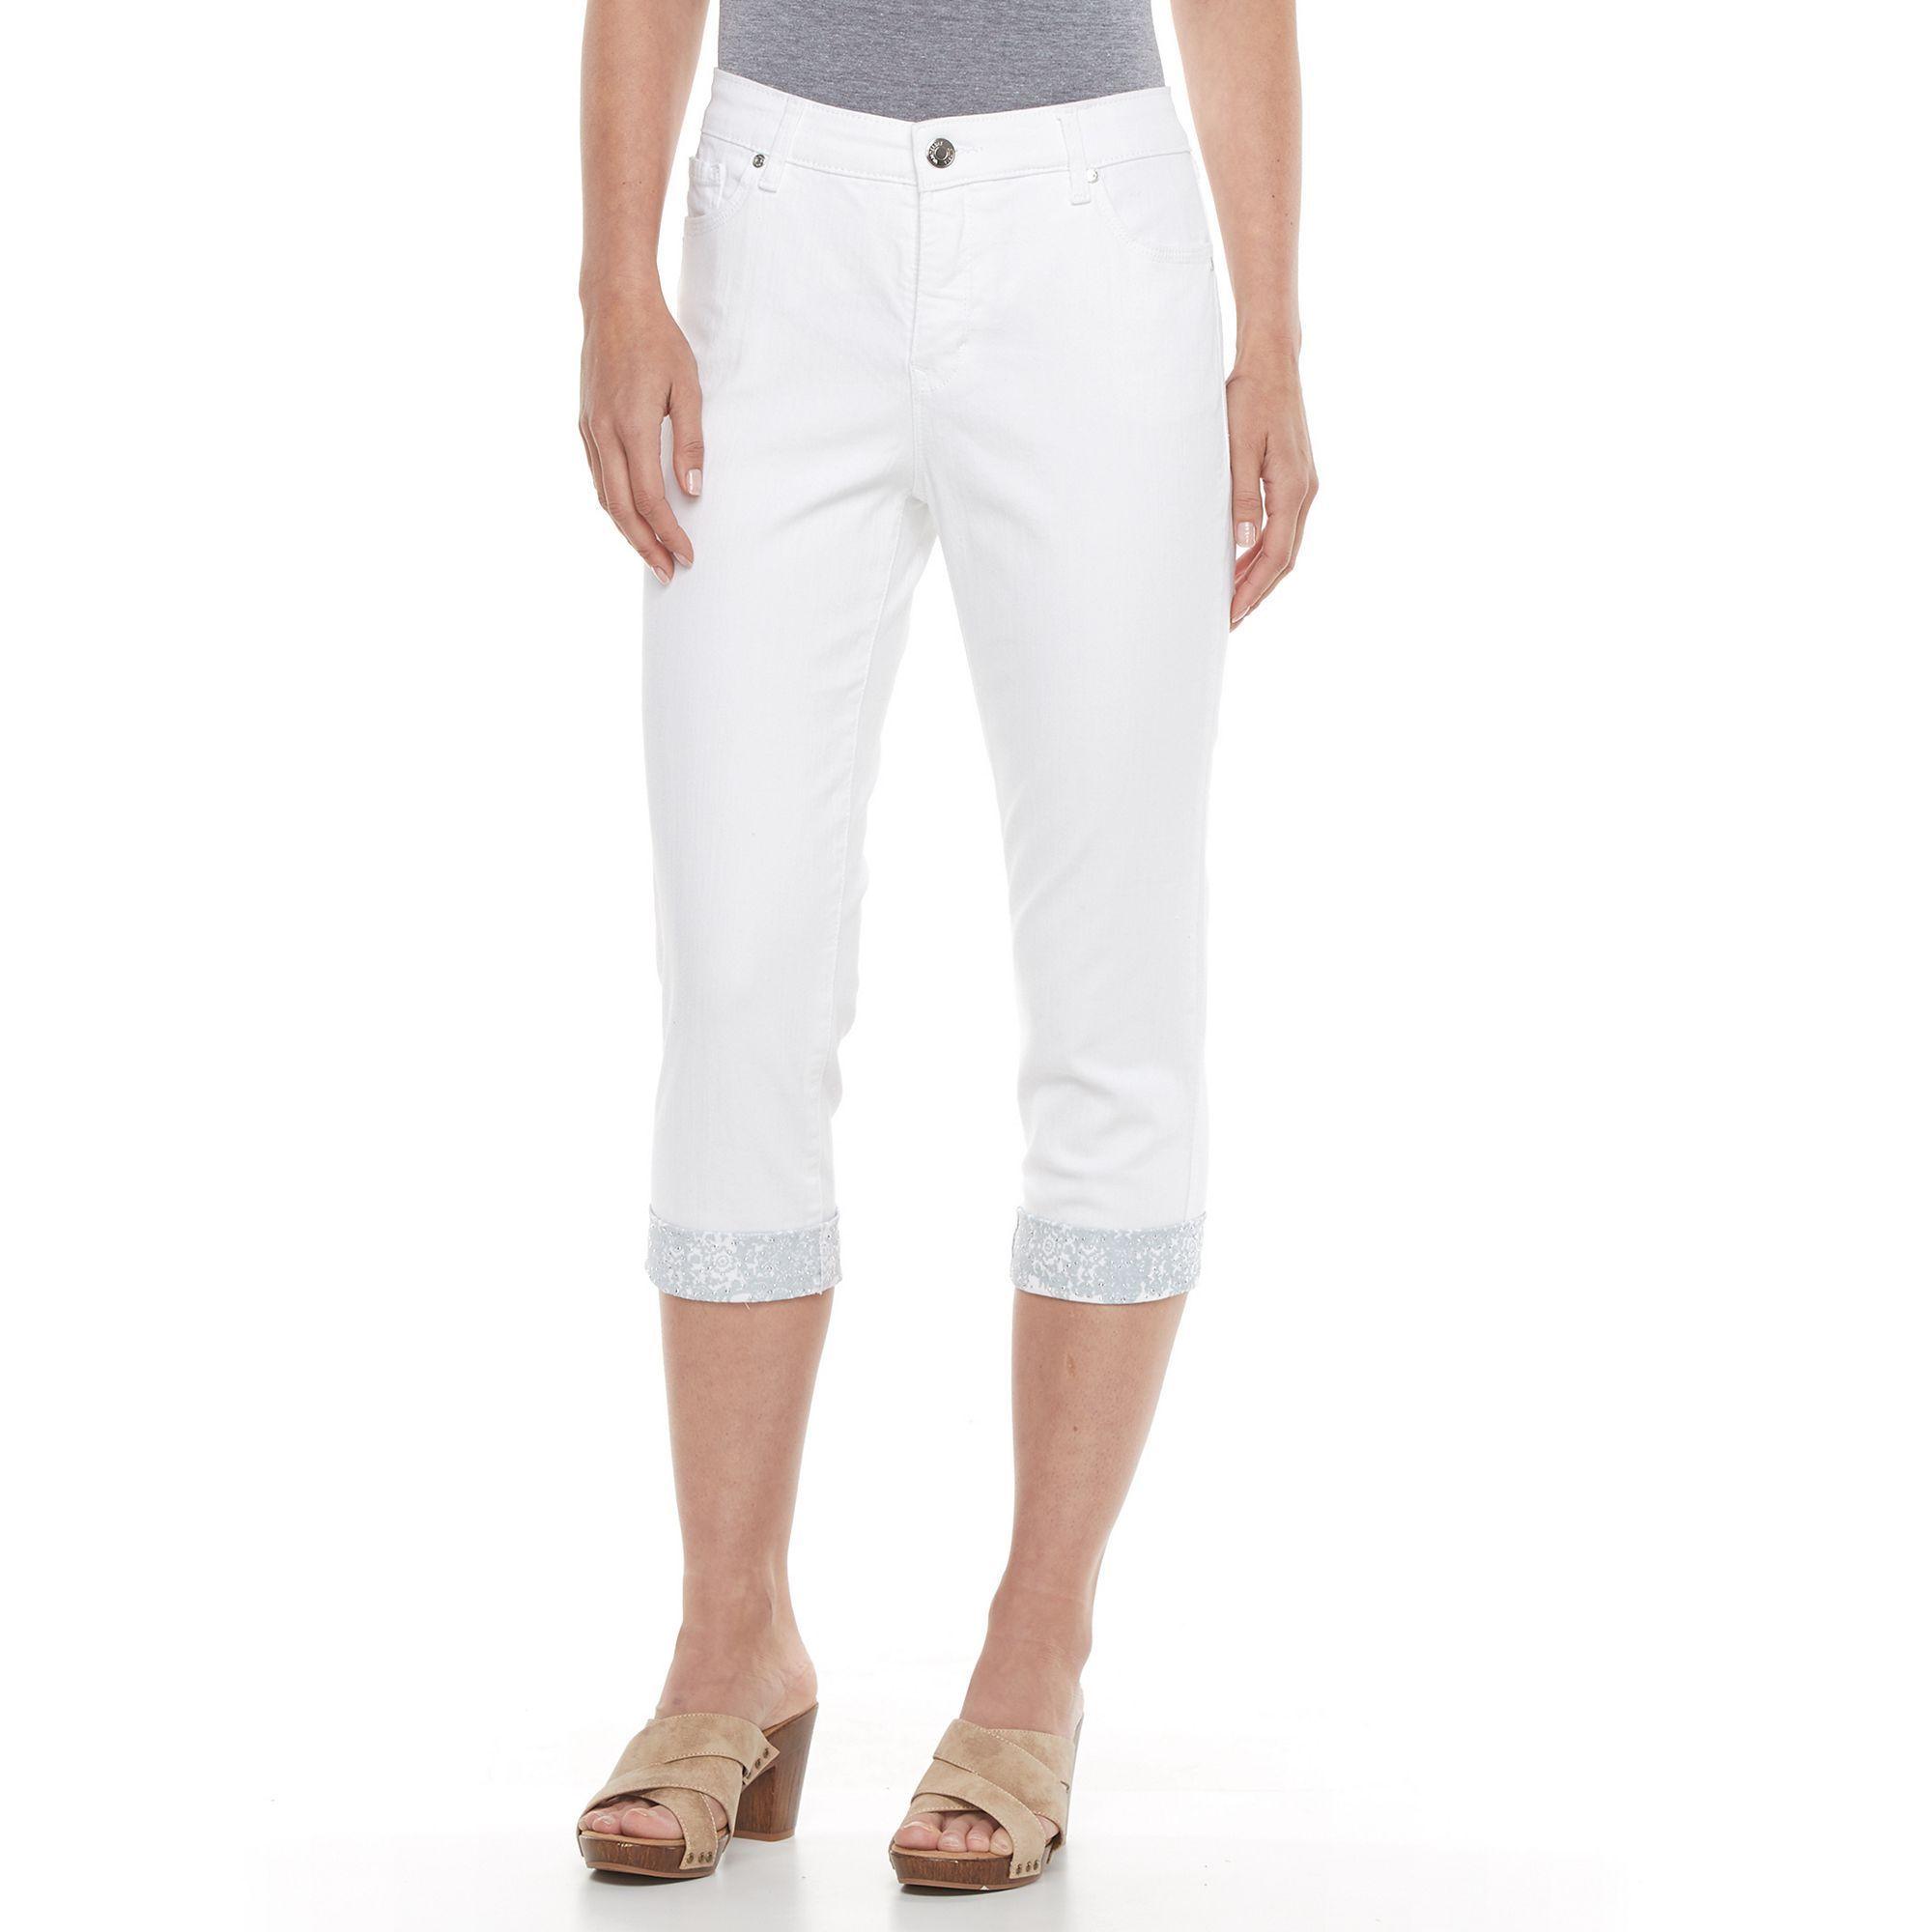 dbe54c175fe Women's Gloria Vanderbilt Jordyn Embellished Capri Jeans, Size: 12, White